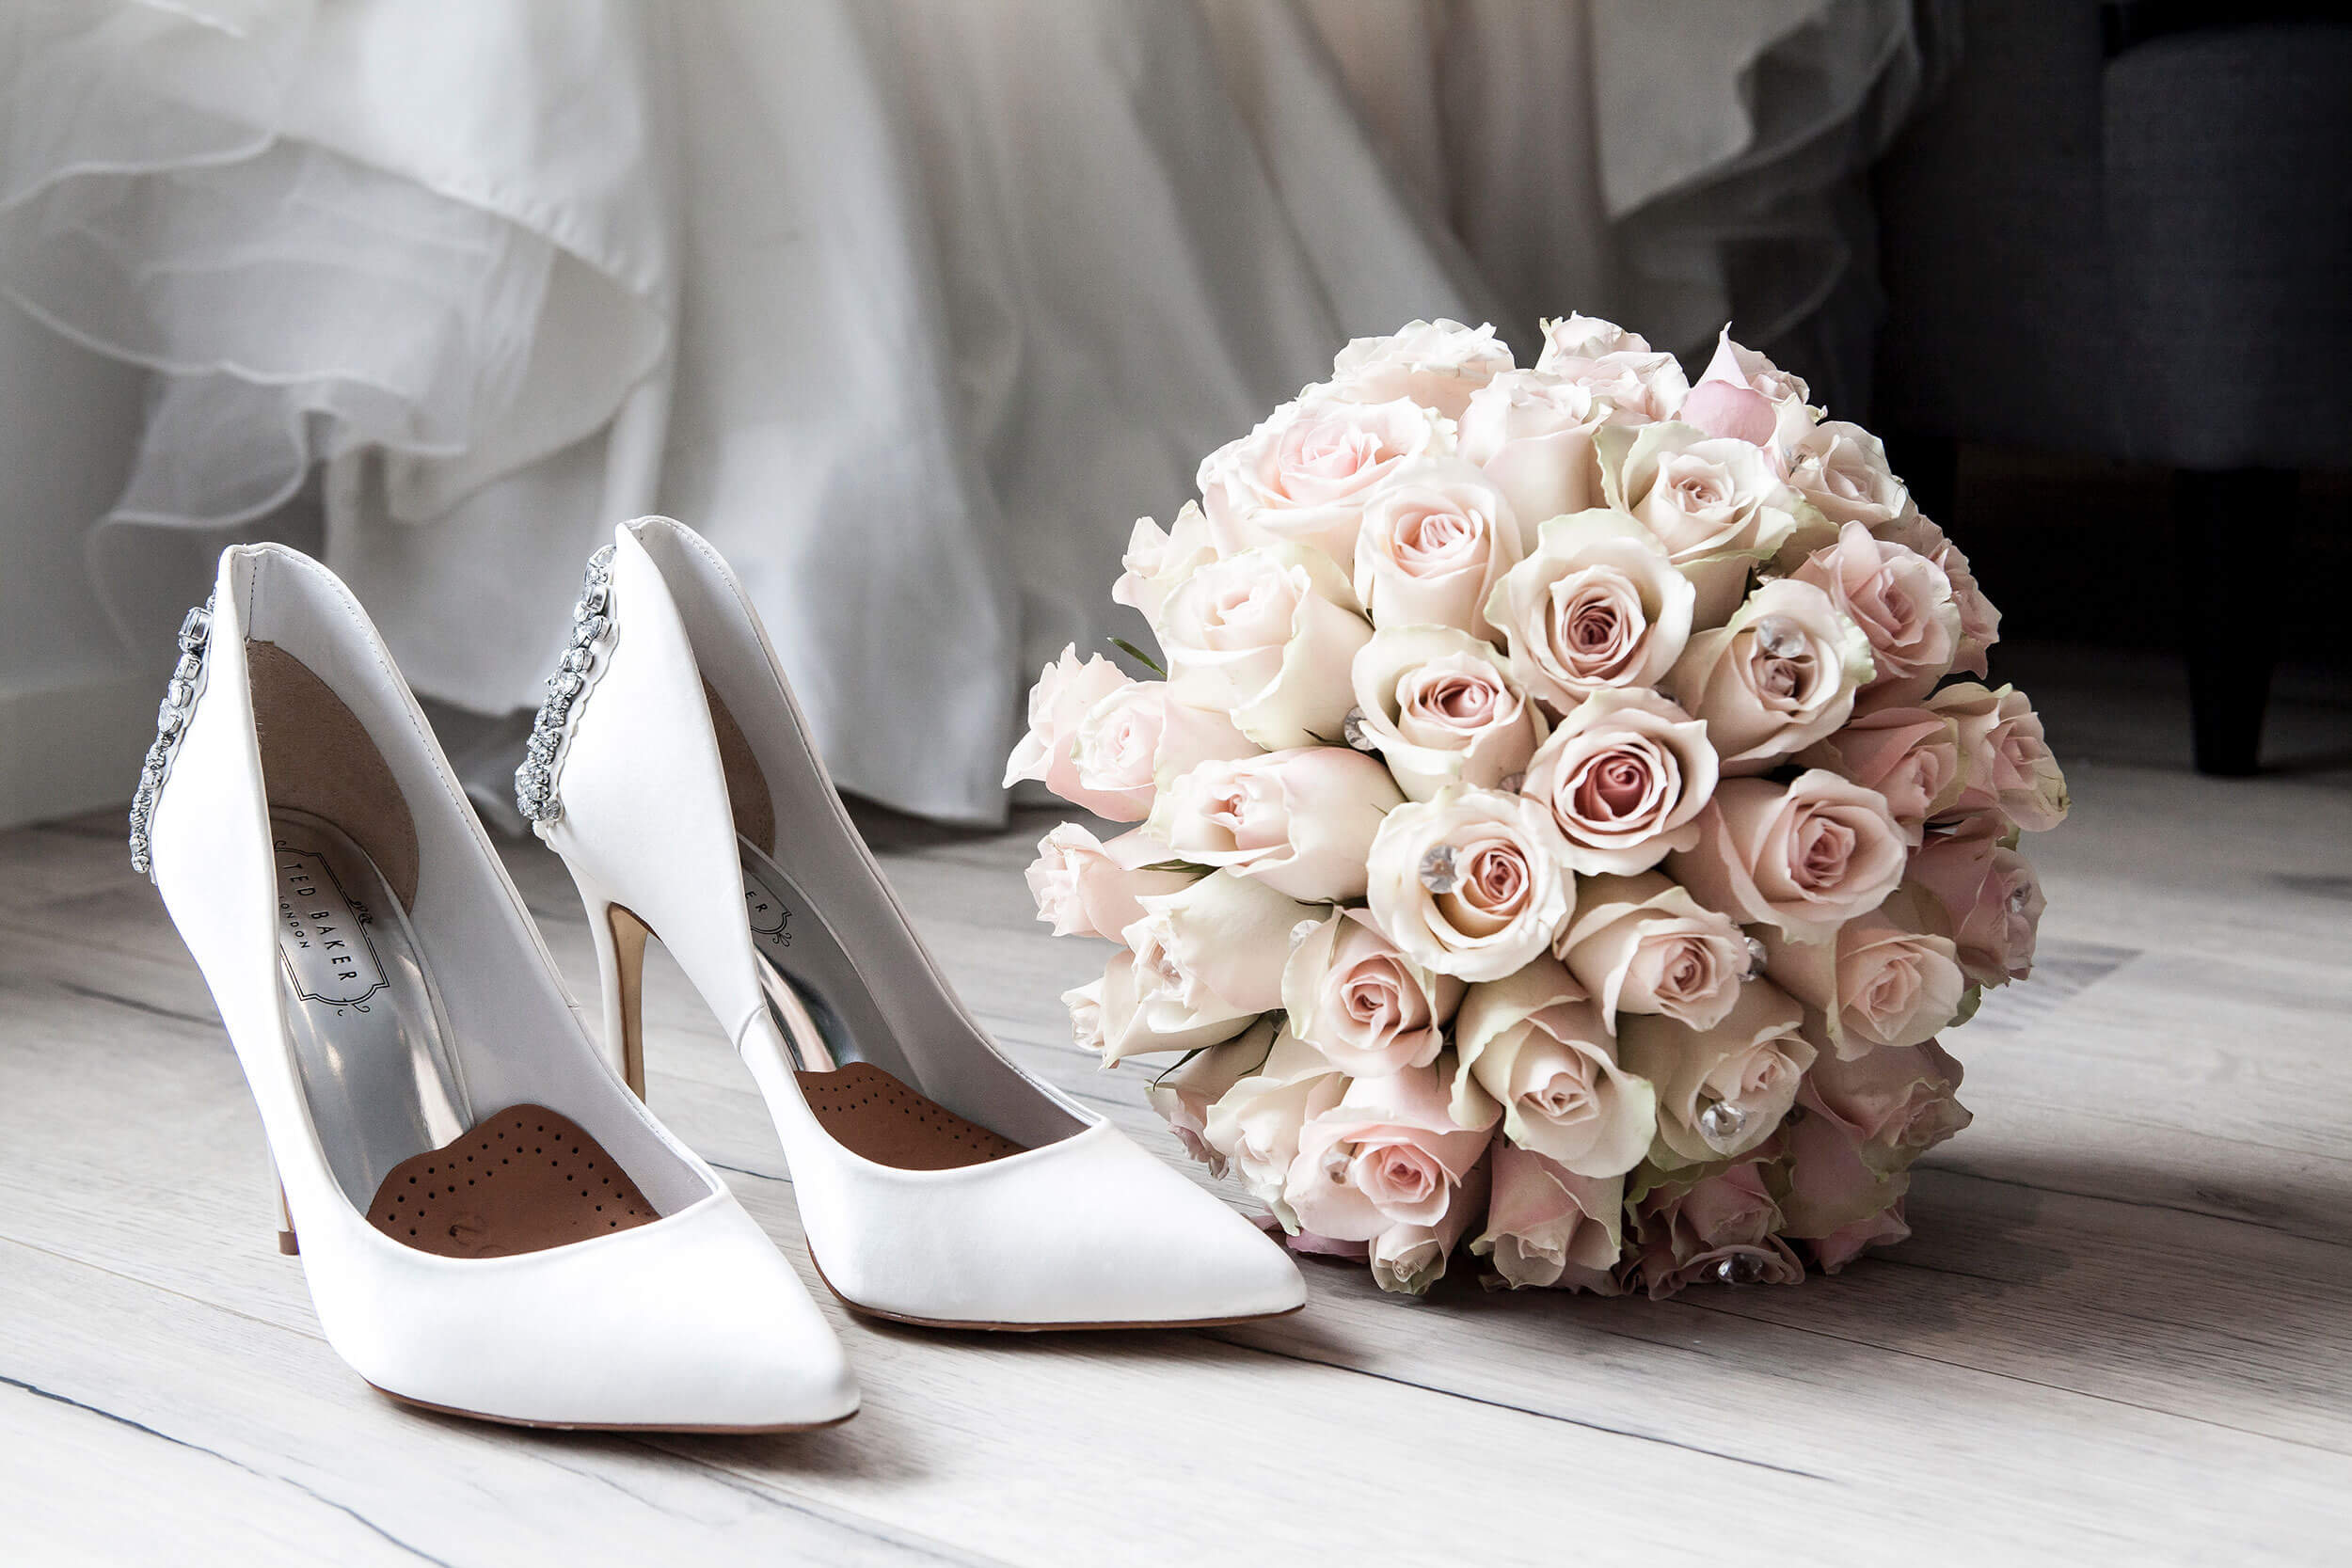 mm-beautiful-bouquet-bridal-shoes-mahrid.jpg